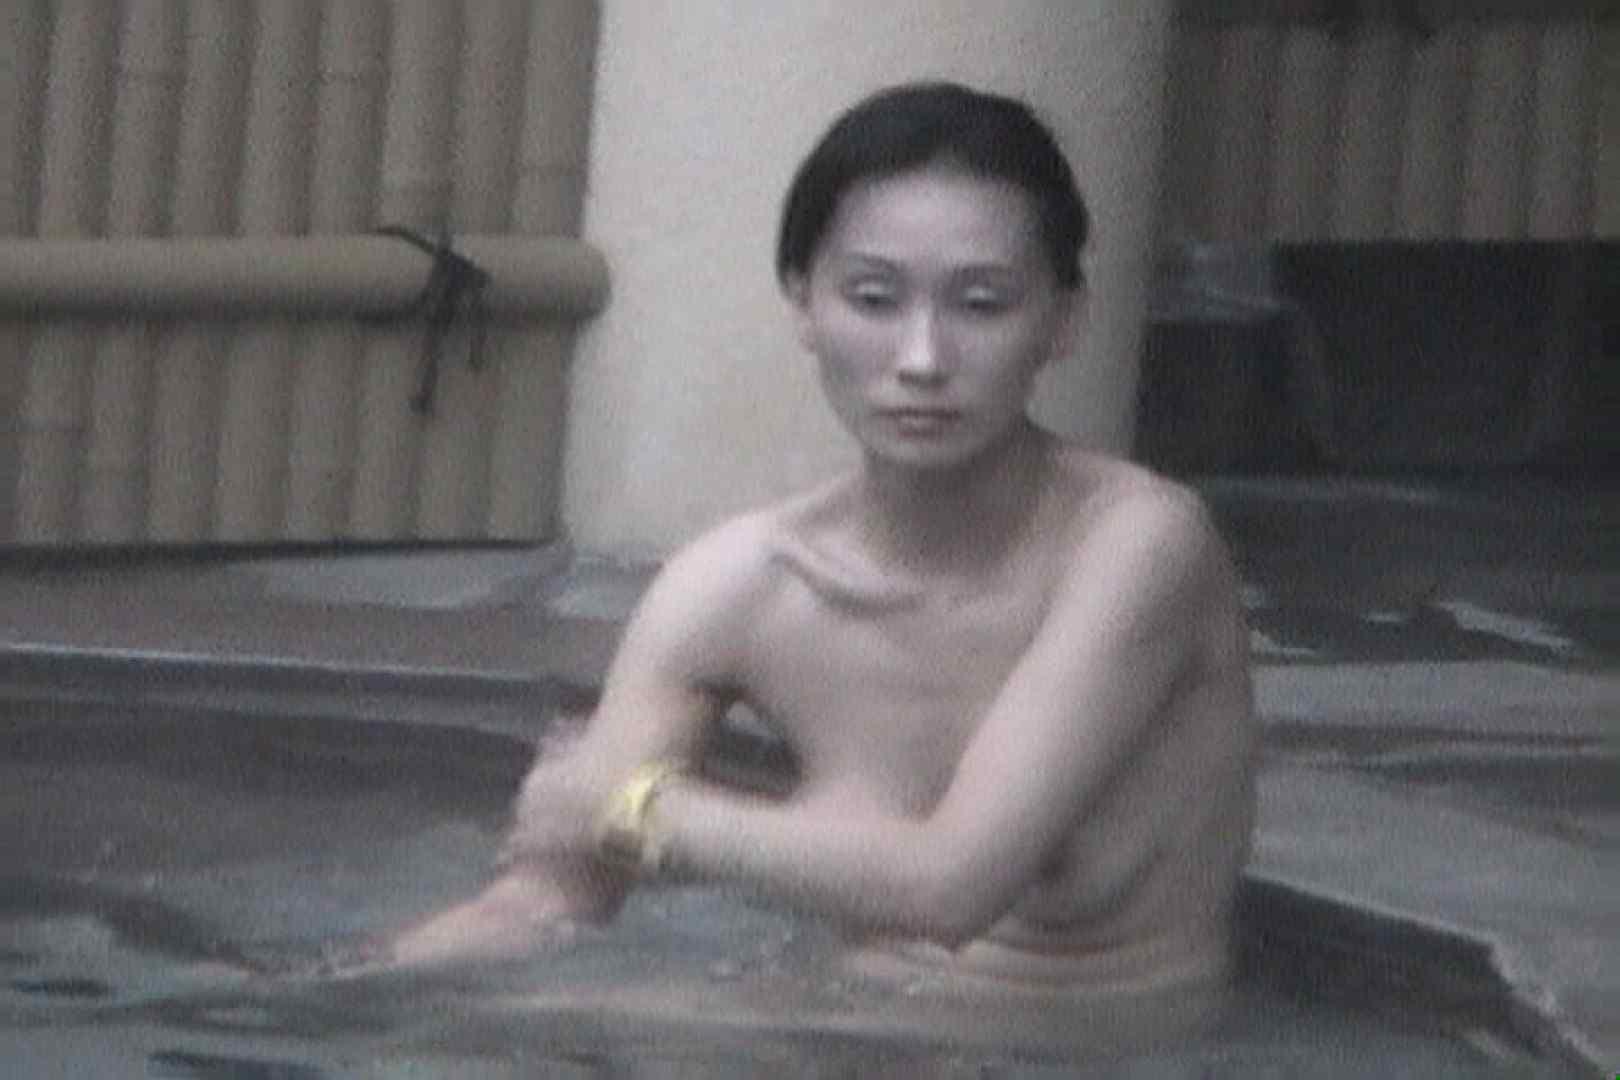 Aquaな露天風呂Vol.557 OLのエロ生活 | 露天風呂  34連発 34